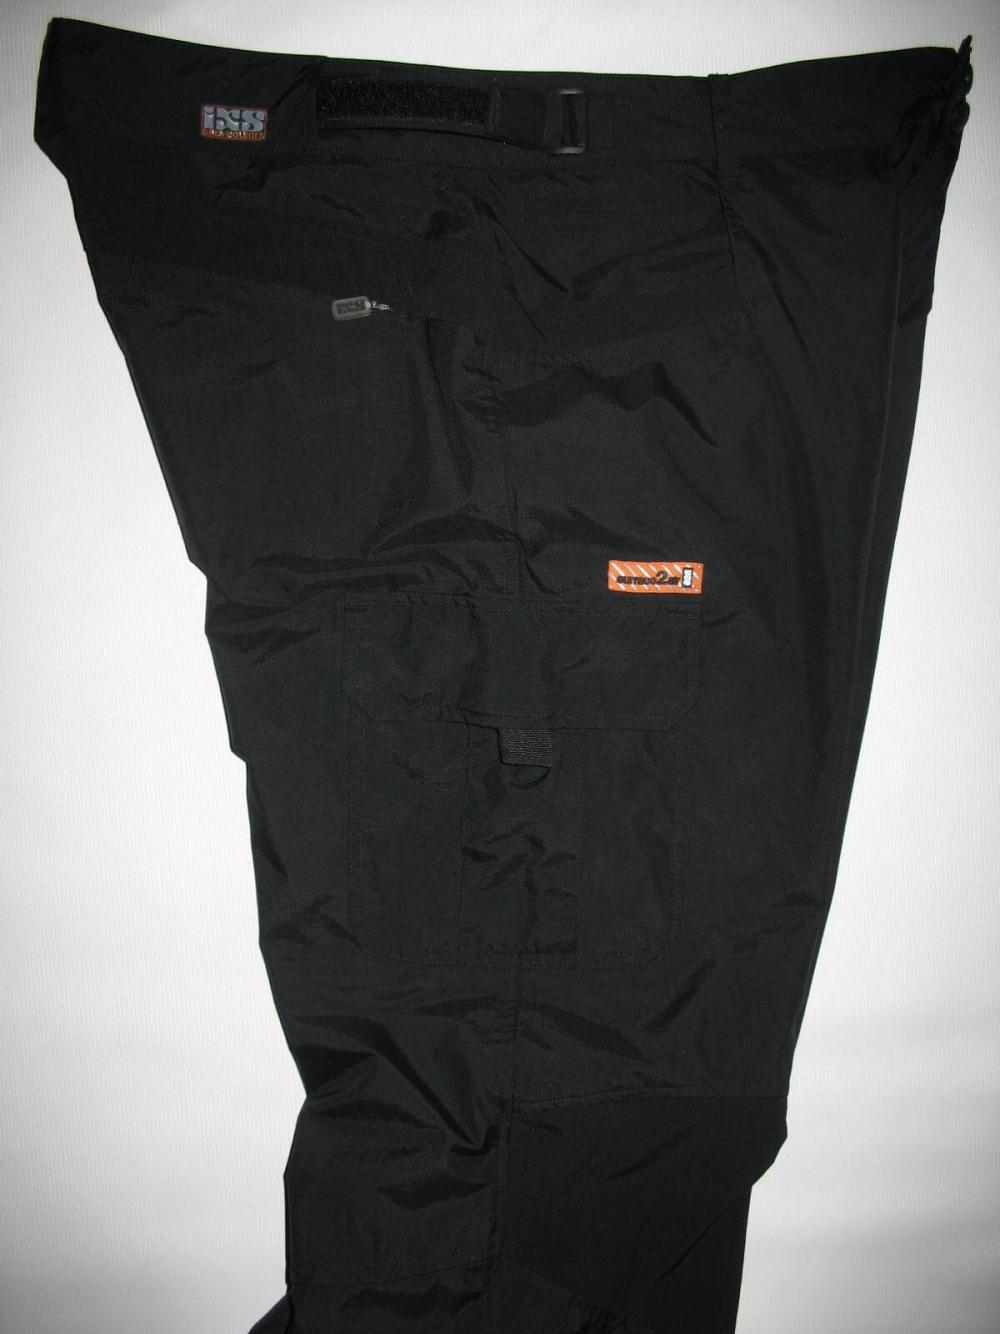 Штаны IXS bc-elite hurtle bike pants (размер XL) - 4